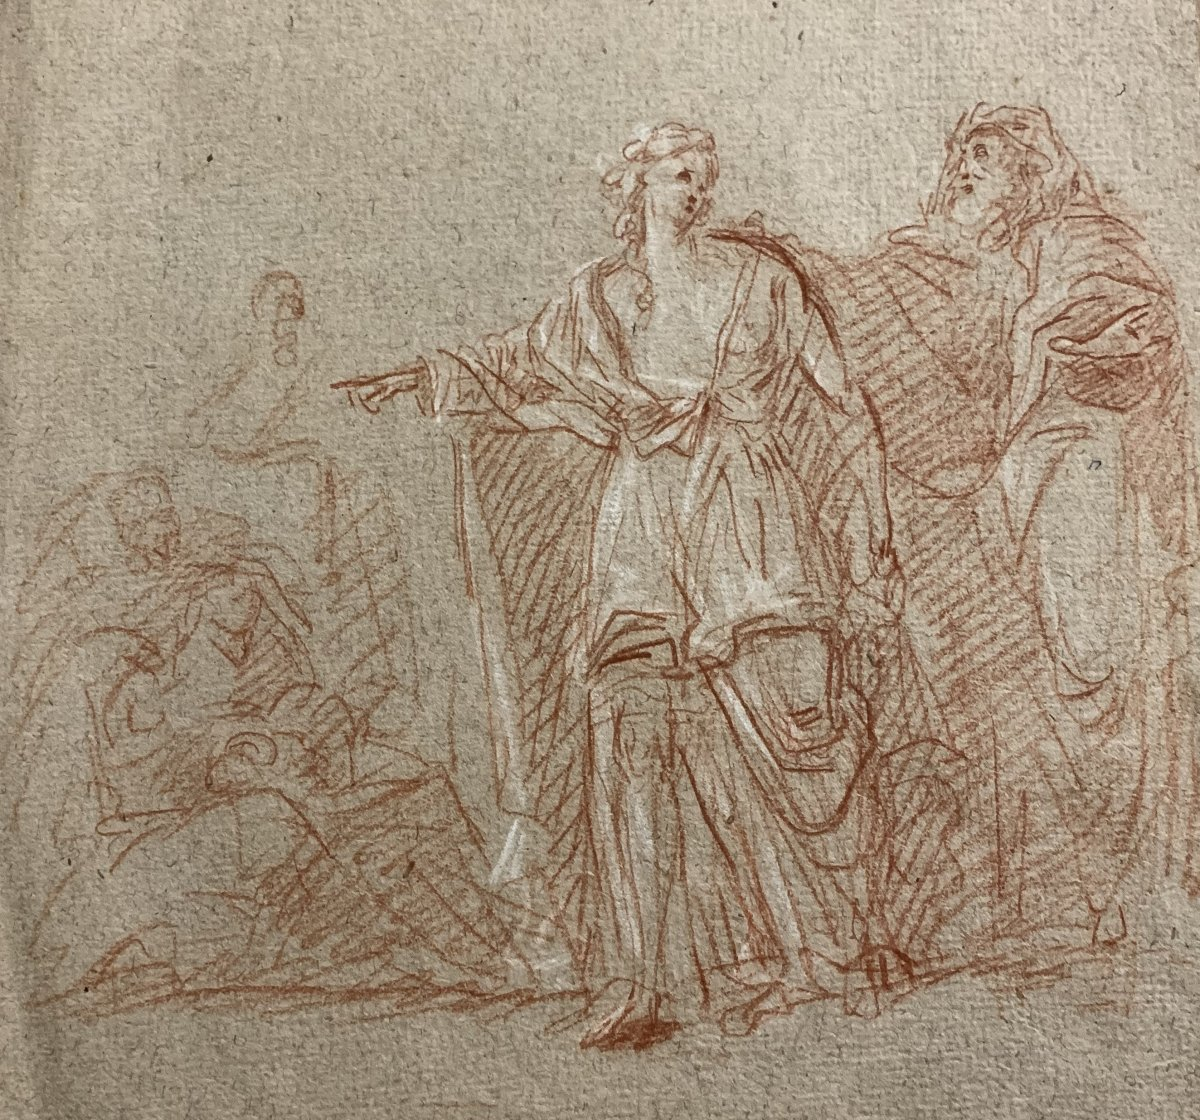 Pierre Théodore Suau (1789-1856), Oedipe Et Antigone